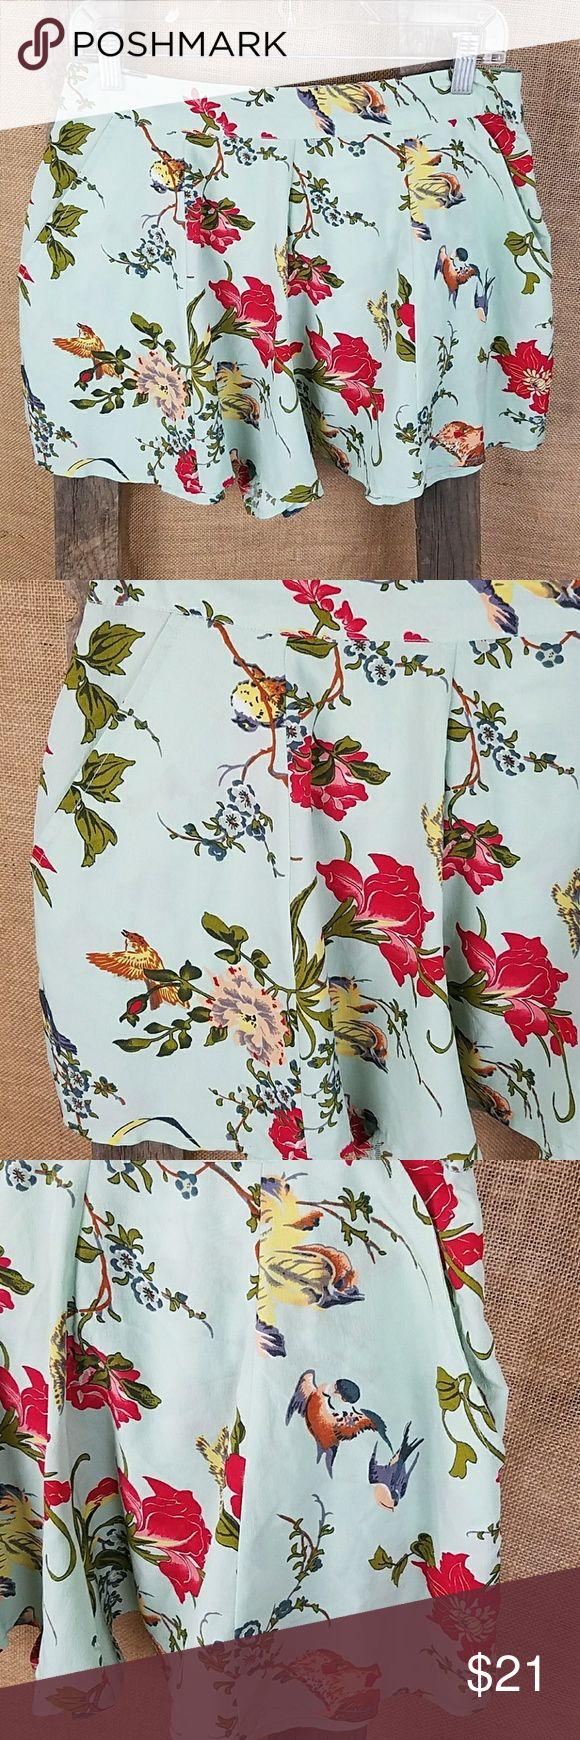 "asos petite women's 8 floral mint color flare bird asos petite women's 8 floral mint color flare short pants.  Waist side to side: 15.25"" Length: 15"" ASOS Petite Shorts"